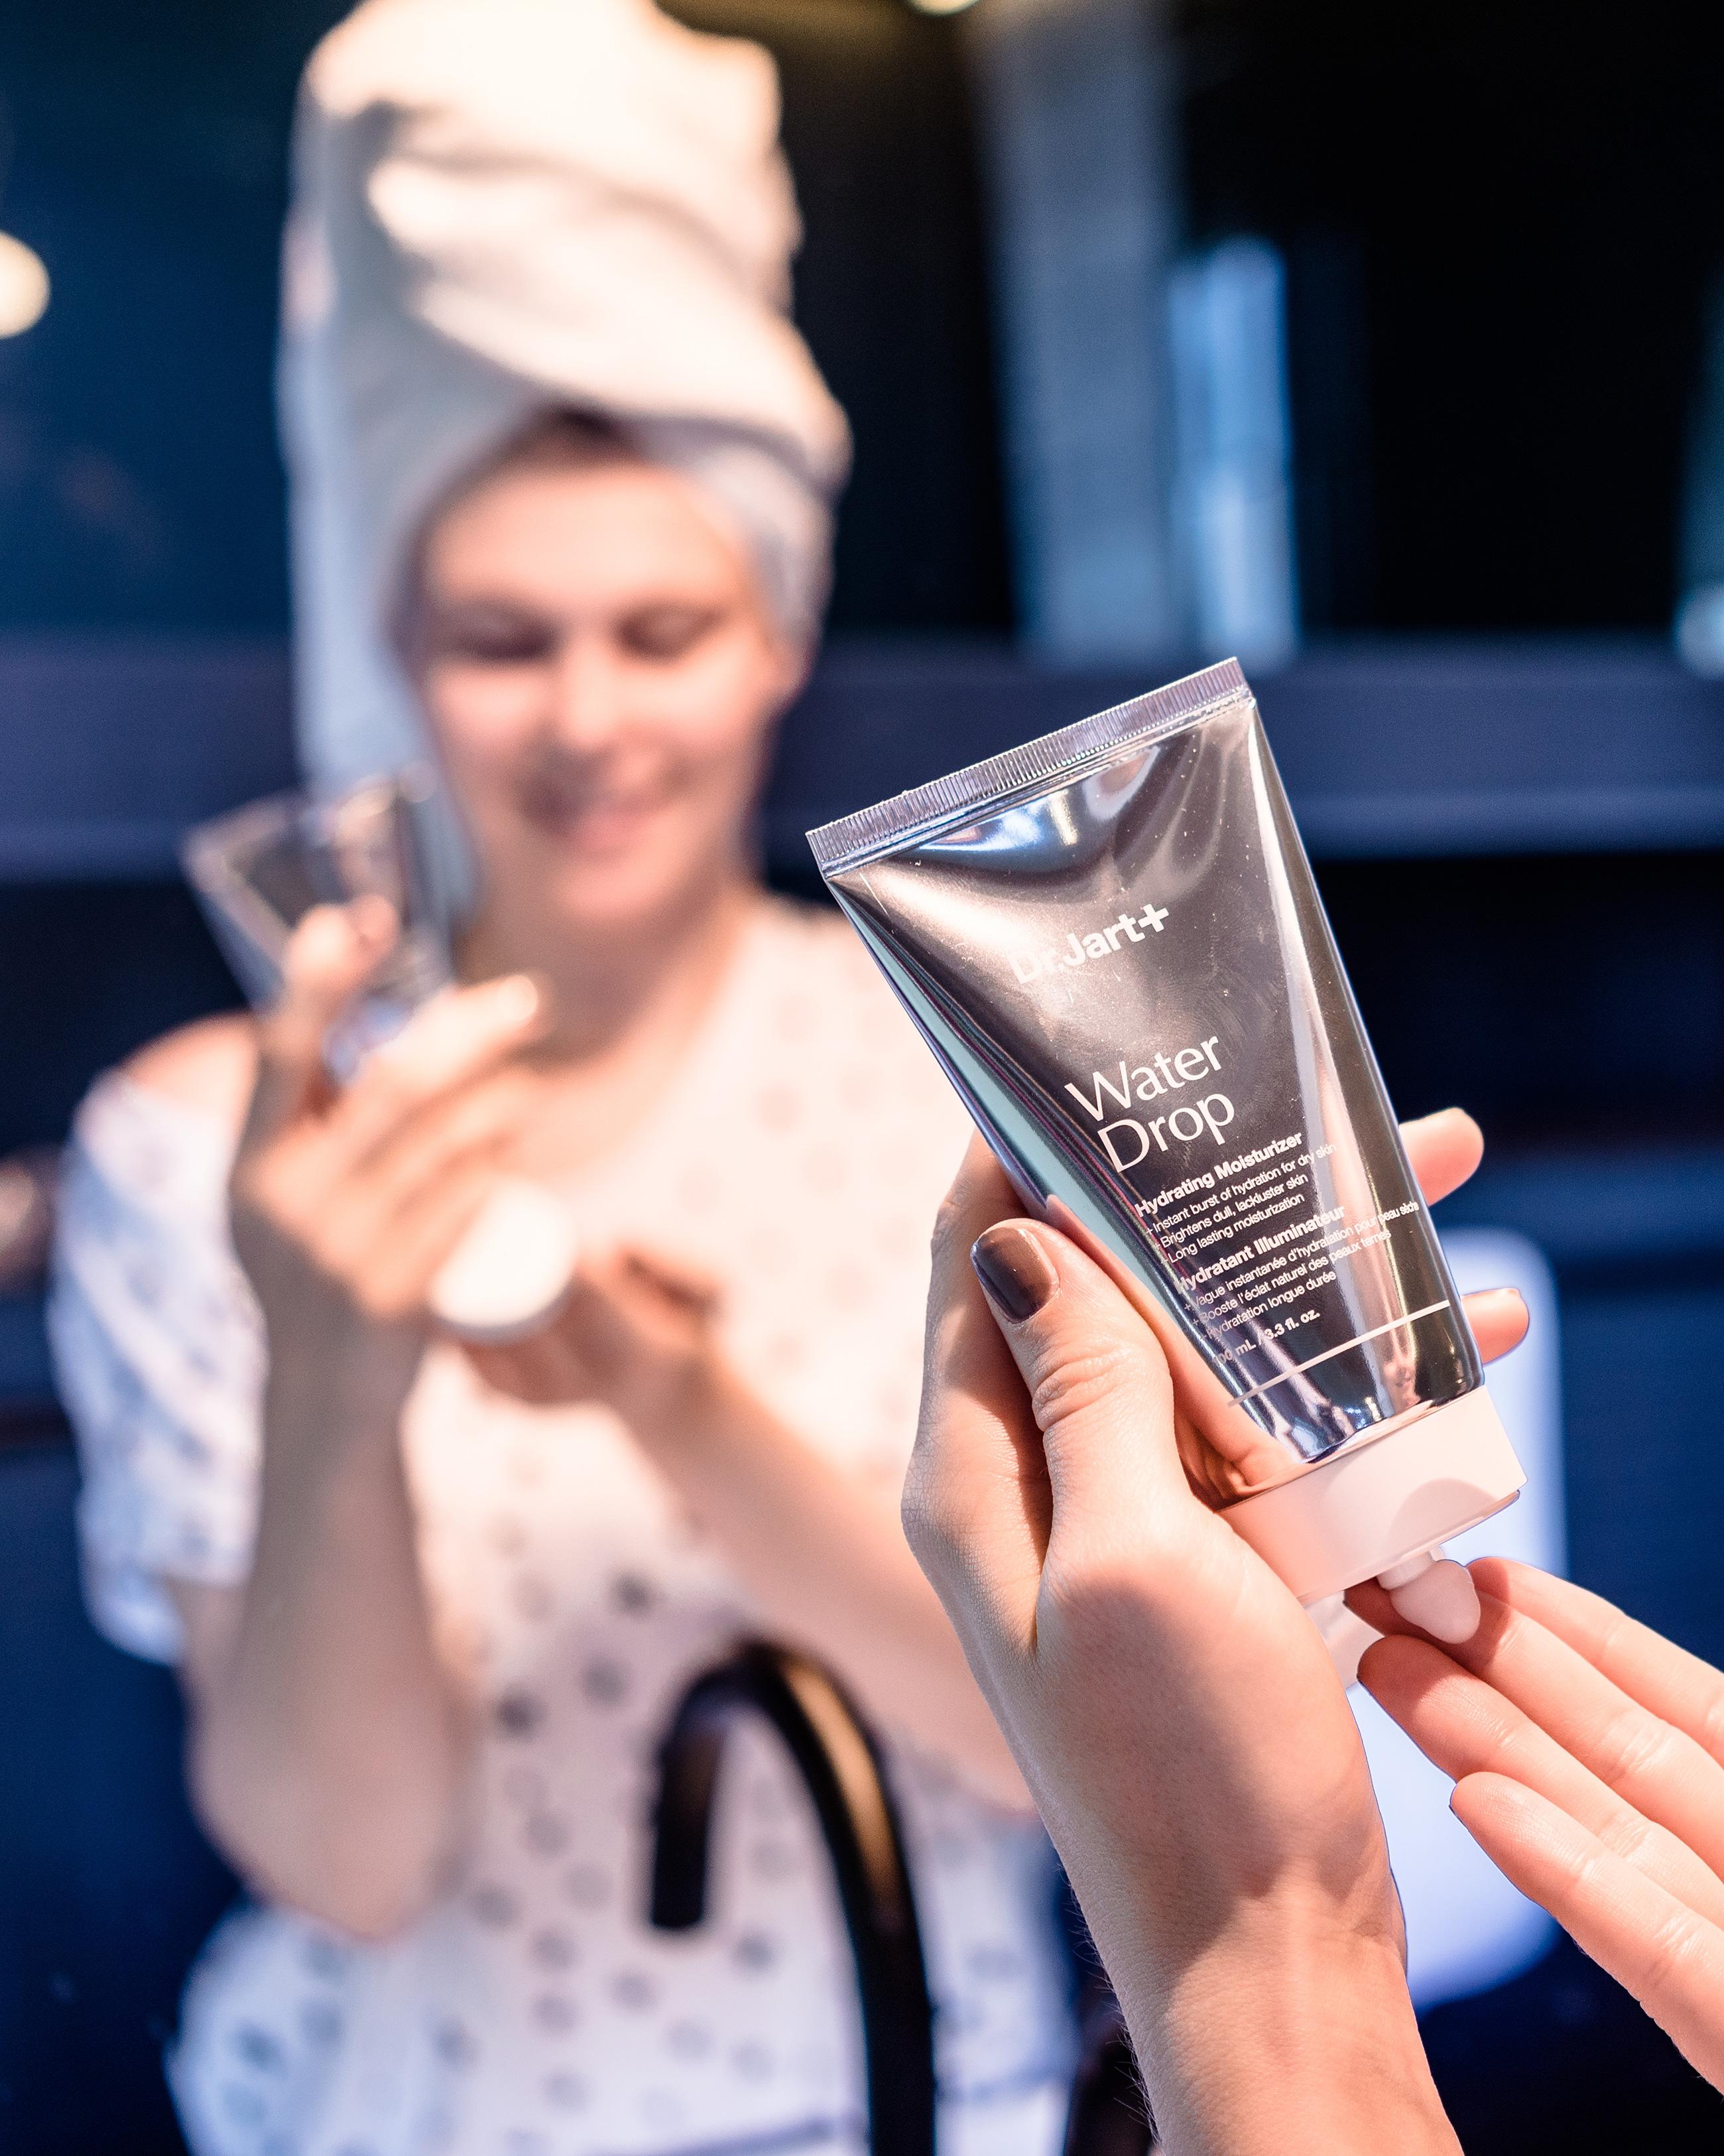 Dr. Jart+ Pflegeprodukte Douglas Makeup Erfahrung Beauty Blog Sunnyinga